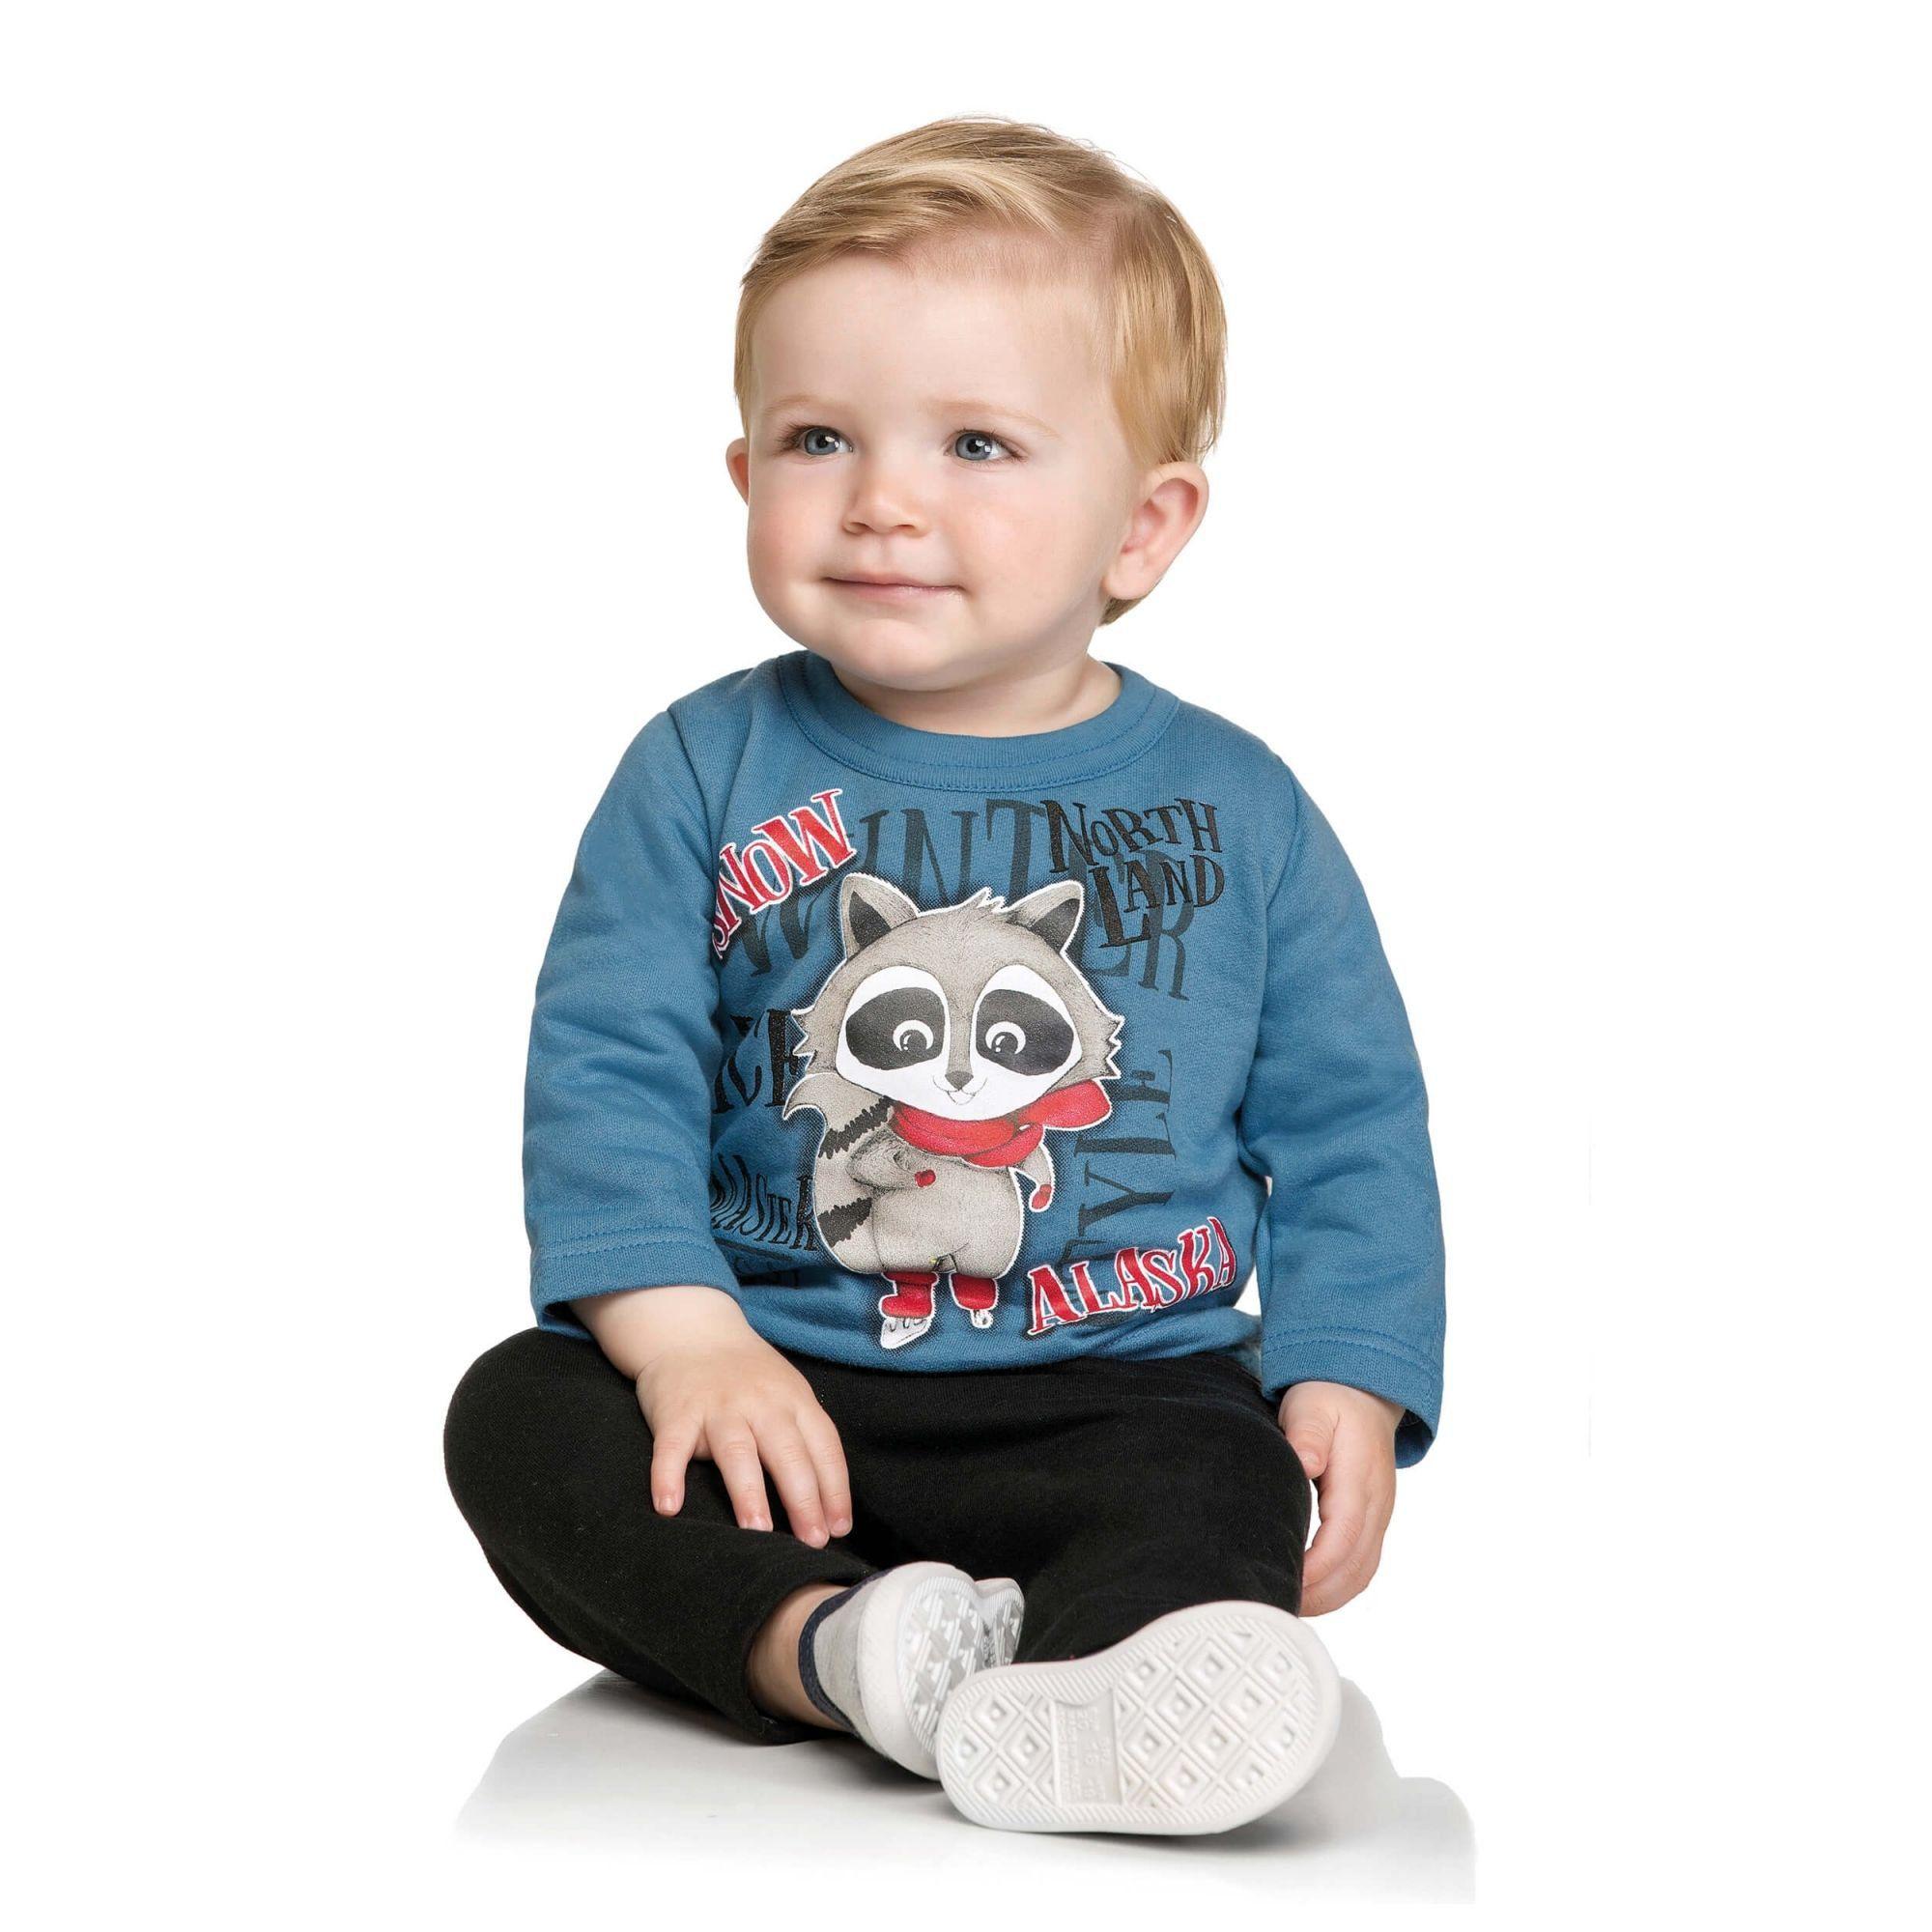 Conjunto Infantil Masculino Inverno Azul Guaxinim Elian